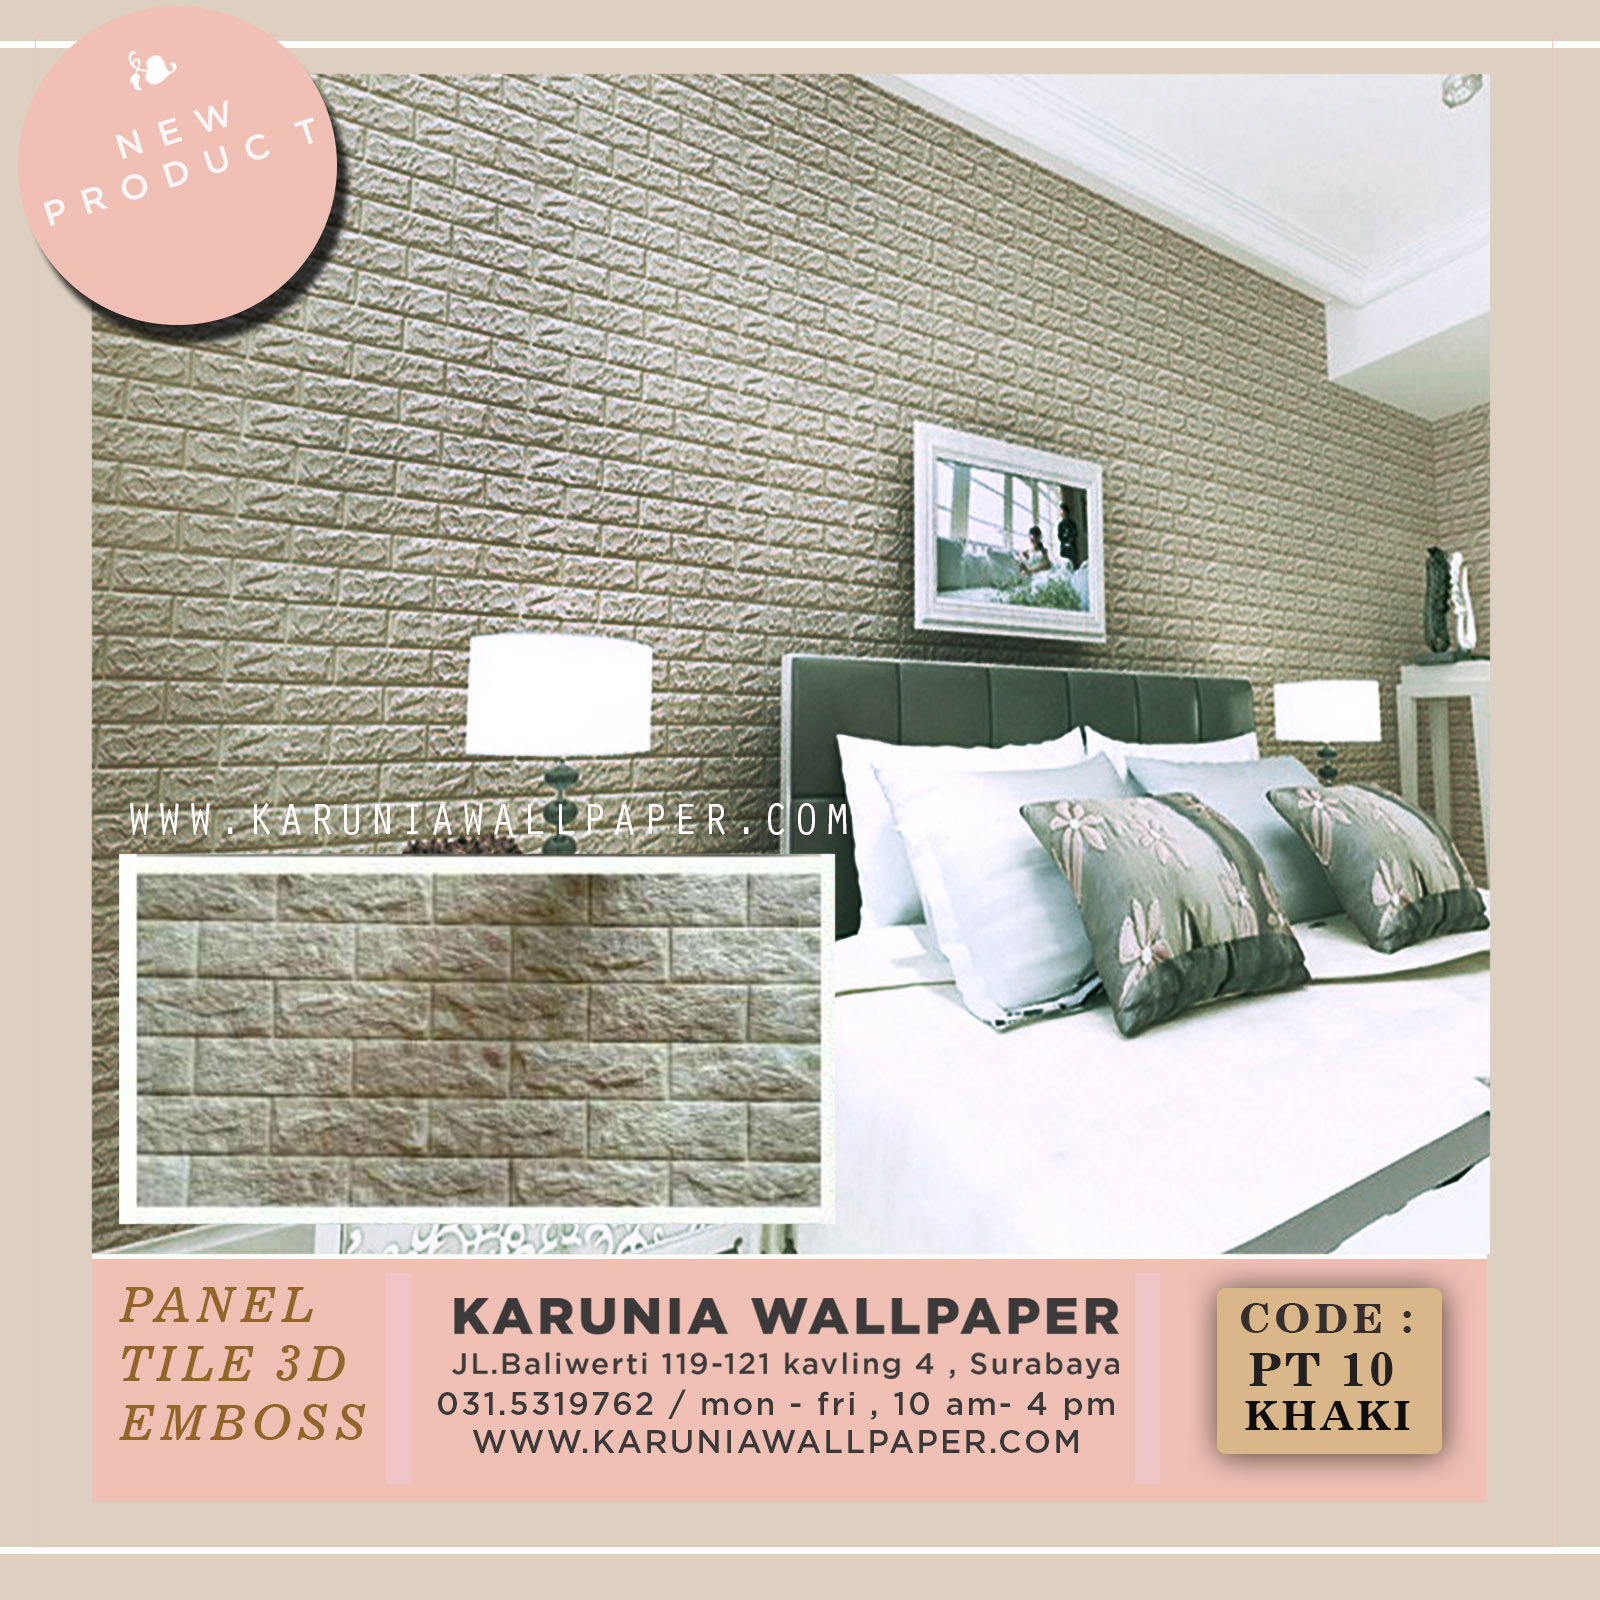 karunia wallpaper 3D timbul emboss surabaya